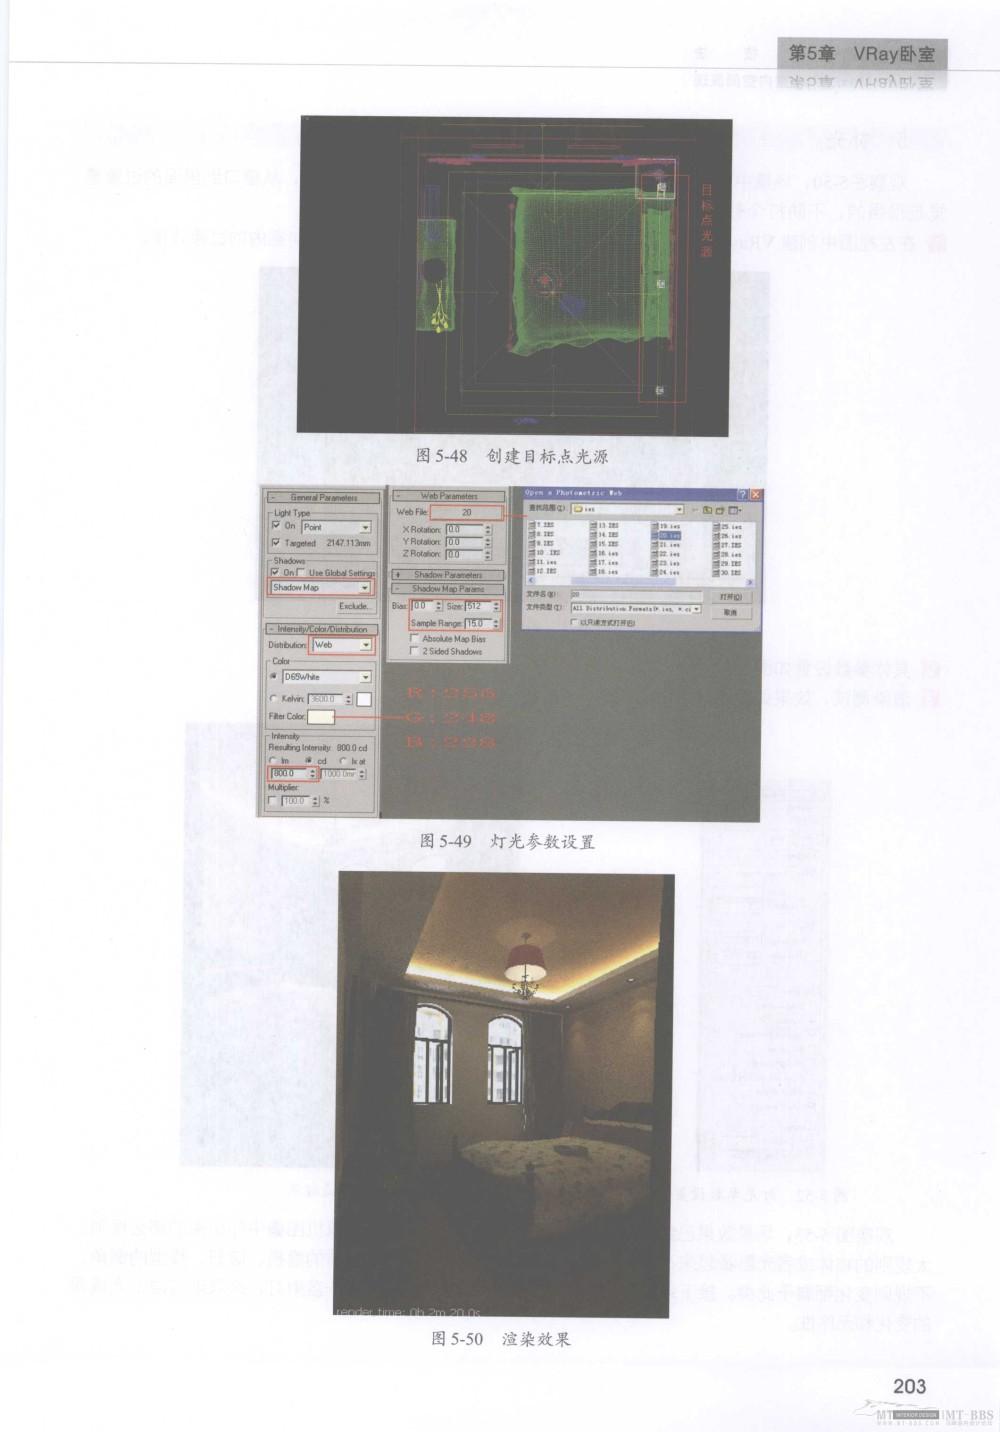 水晶石技法-3ds_Max&VRay室内空间表现_水晶石技法-3ds_Max&VRay室内空间表现_页面_209.jpg